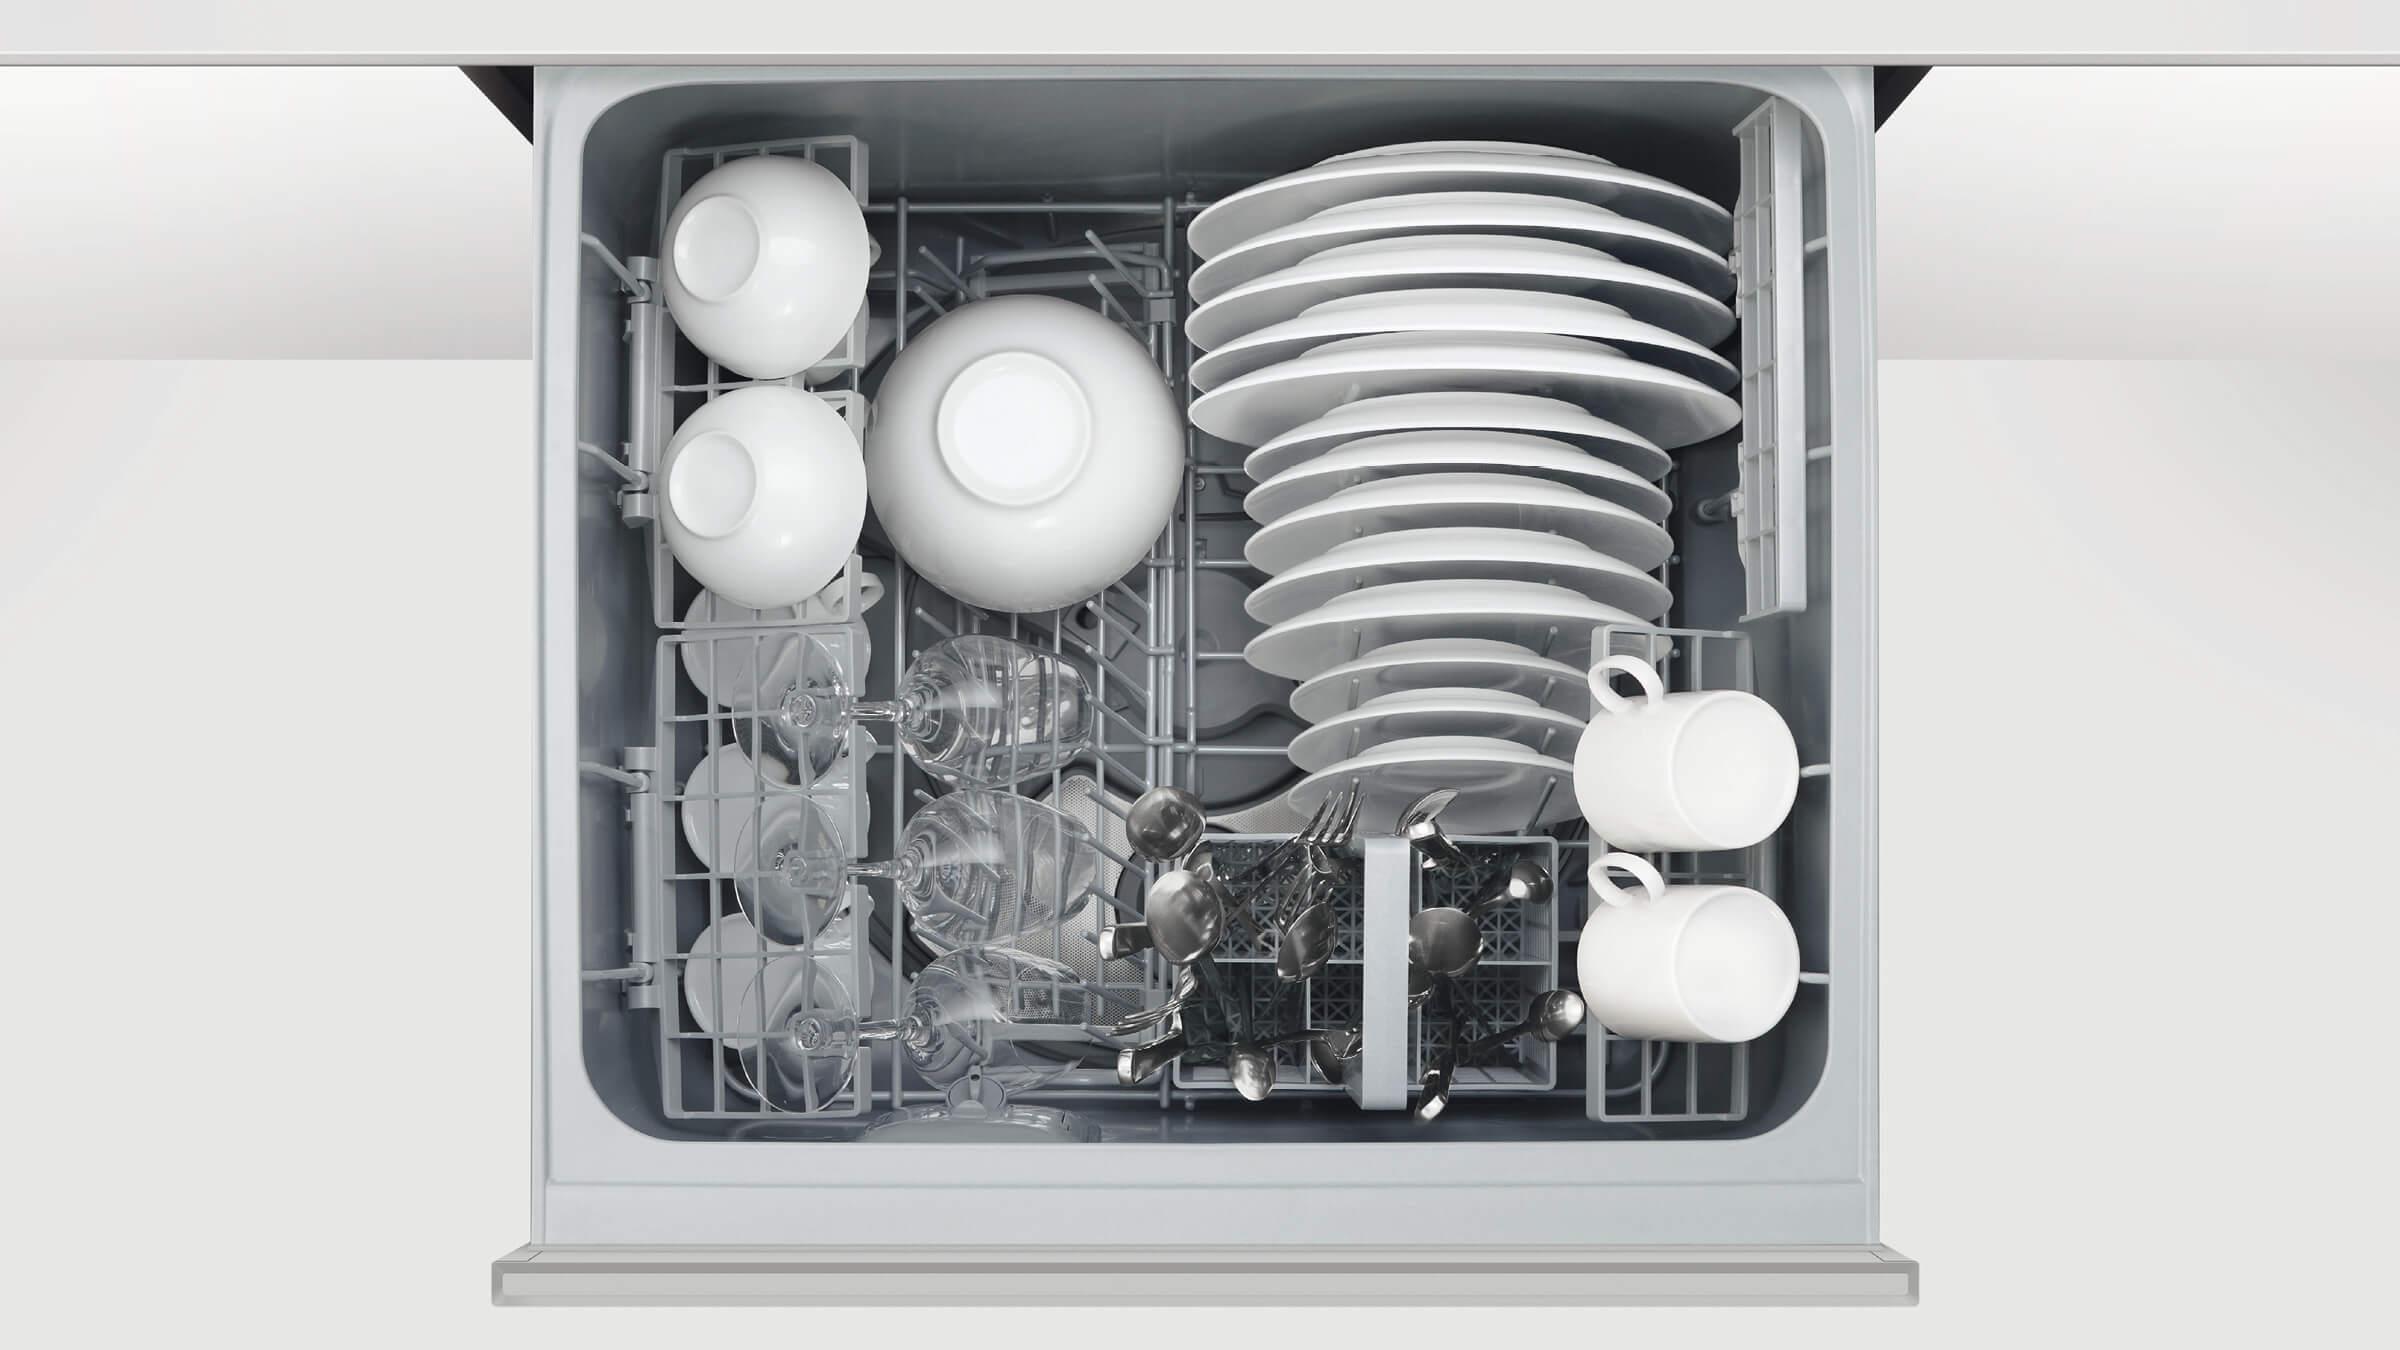 ADA compliant Double DishDrawer dishwasher